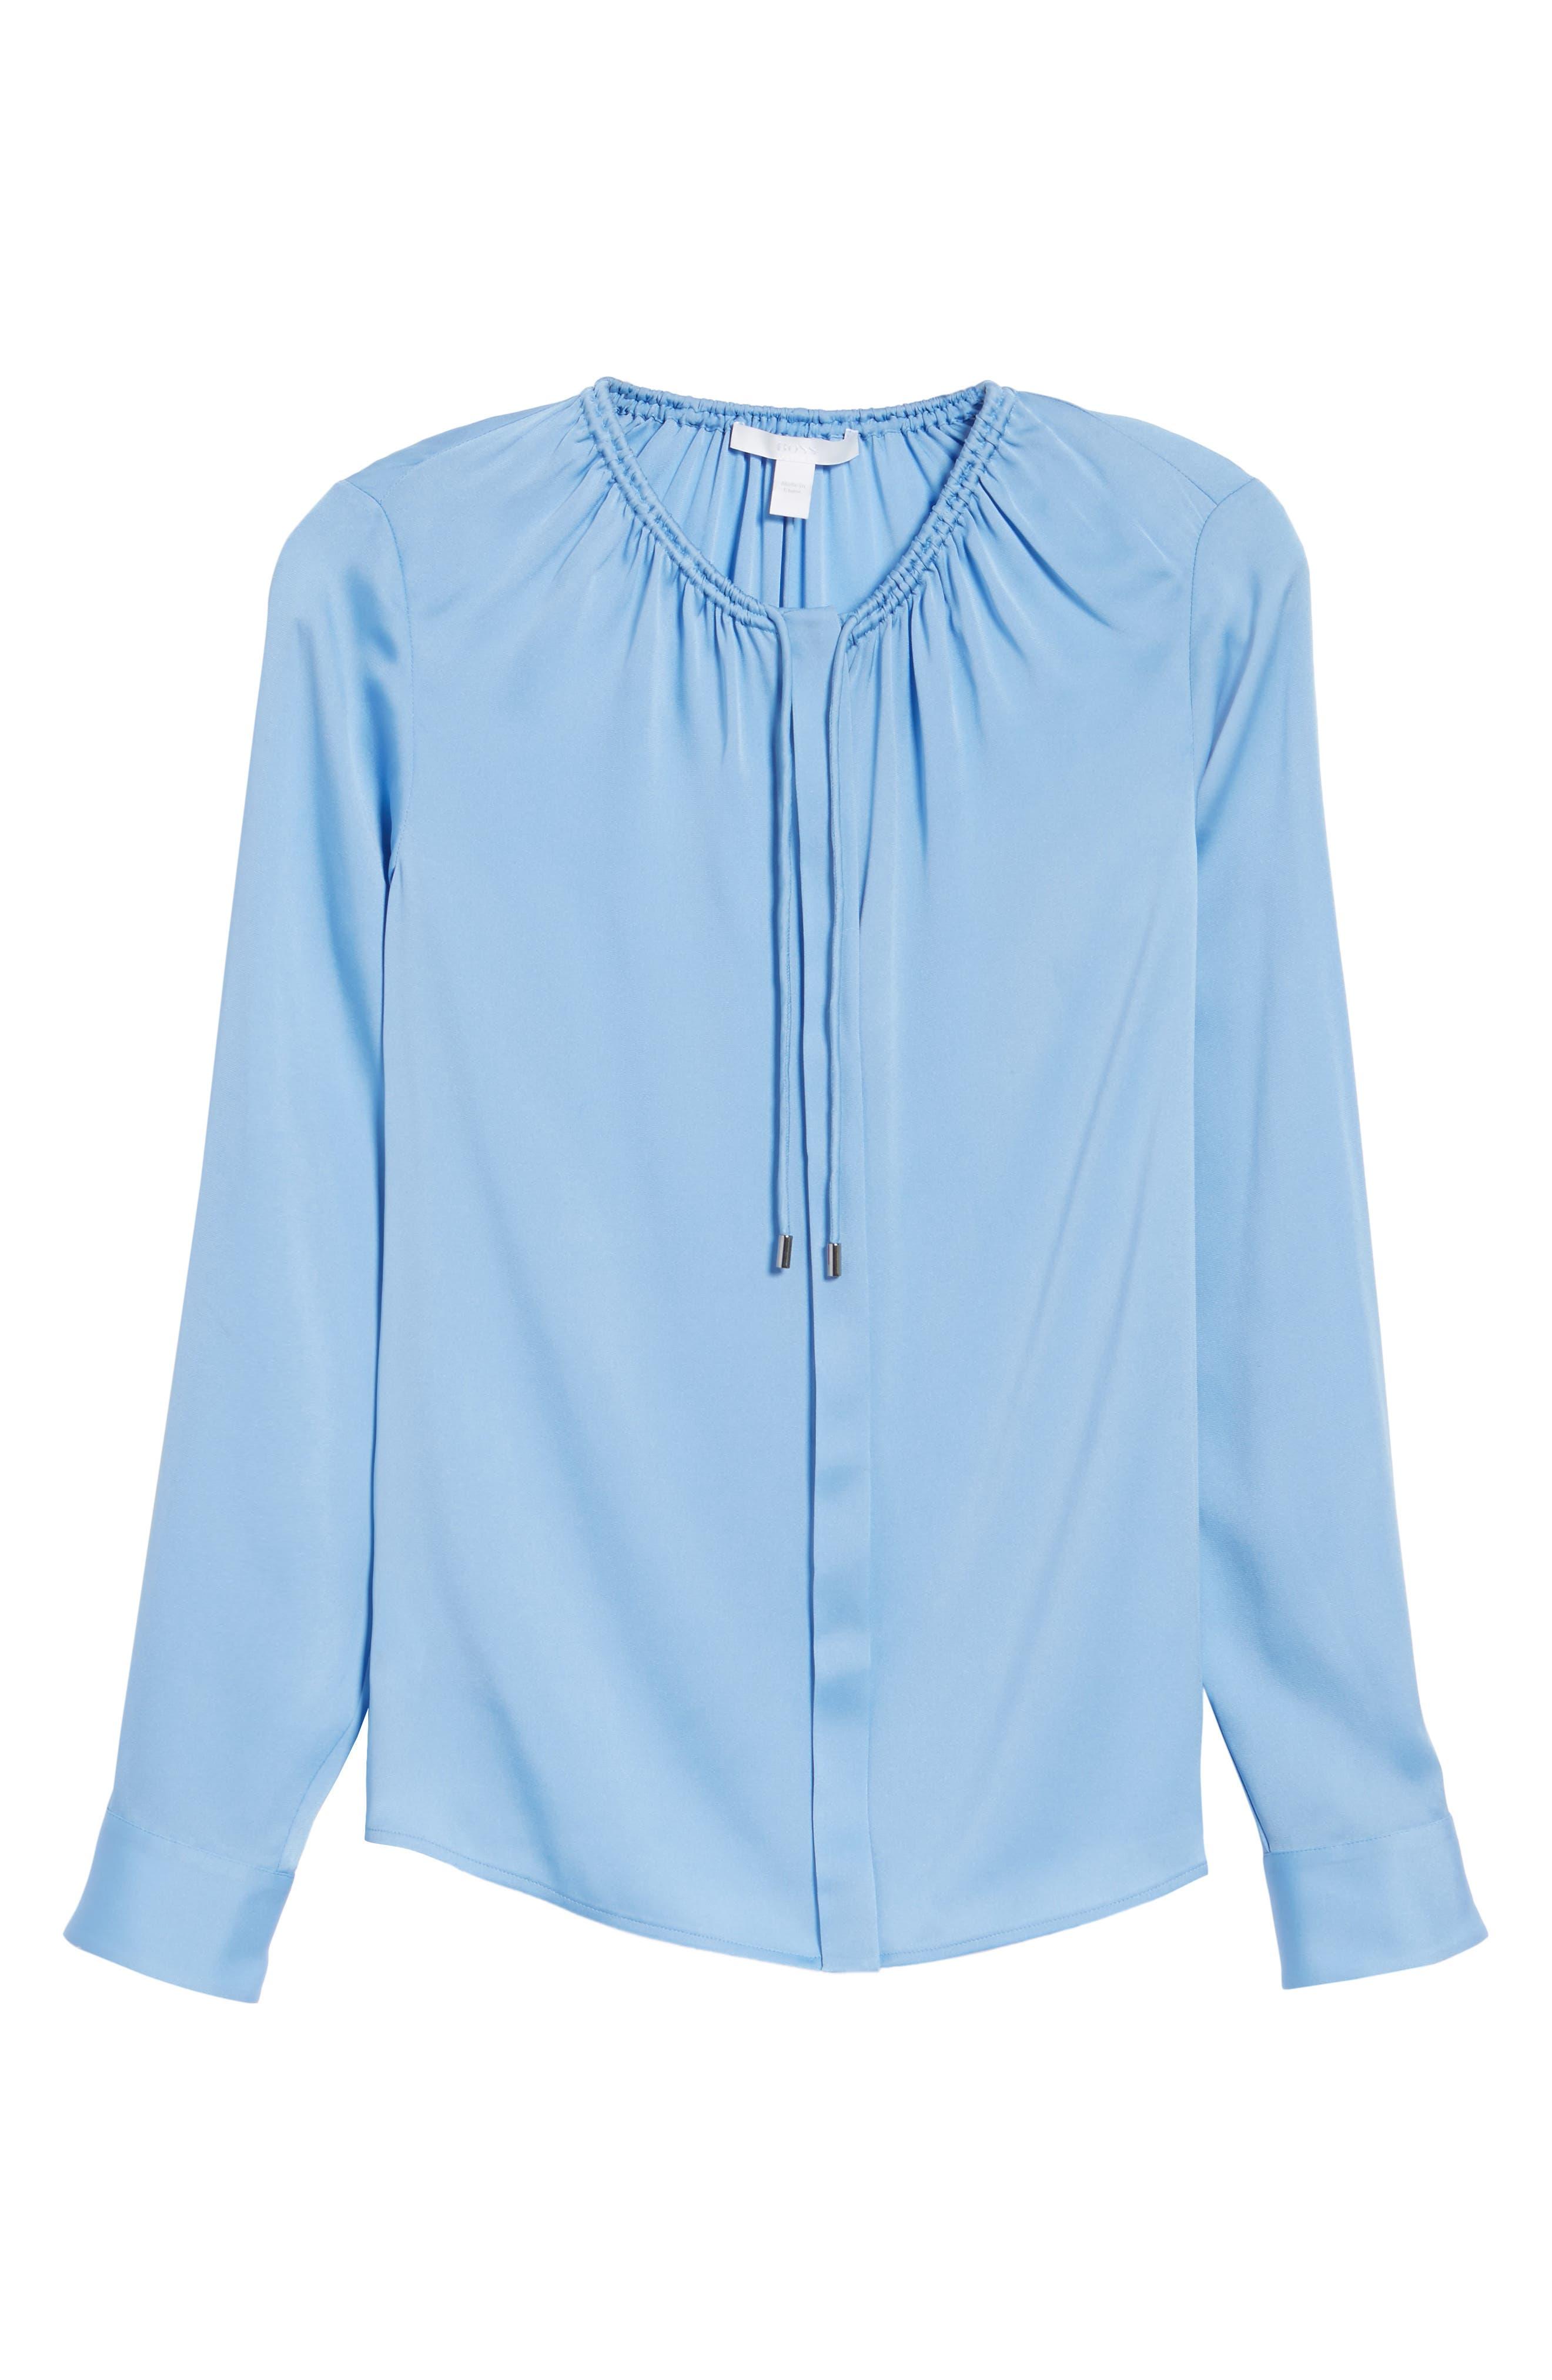 Banorana Stretch Silk Blouse,                             Alternate thumbnail 6, color,                             Blue Sky